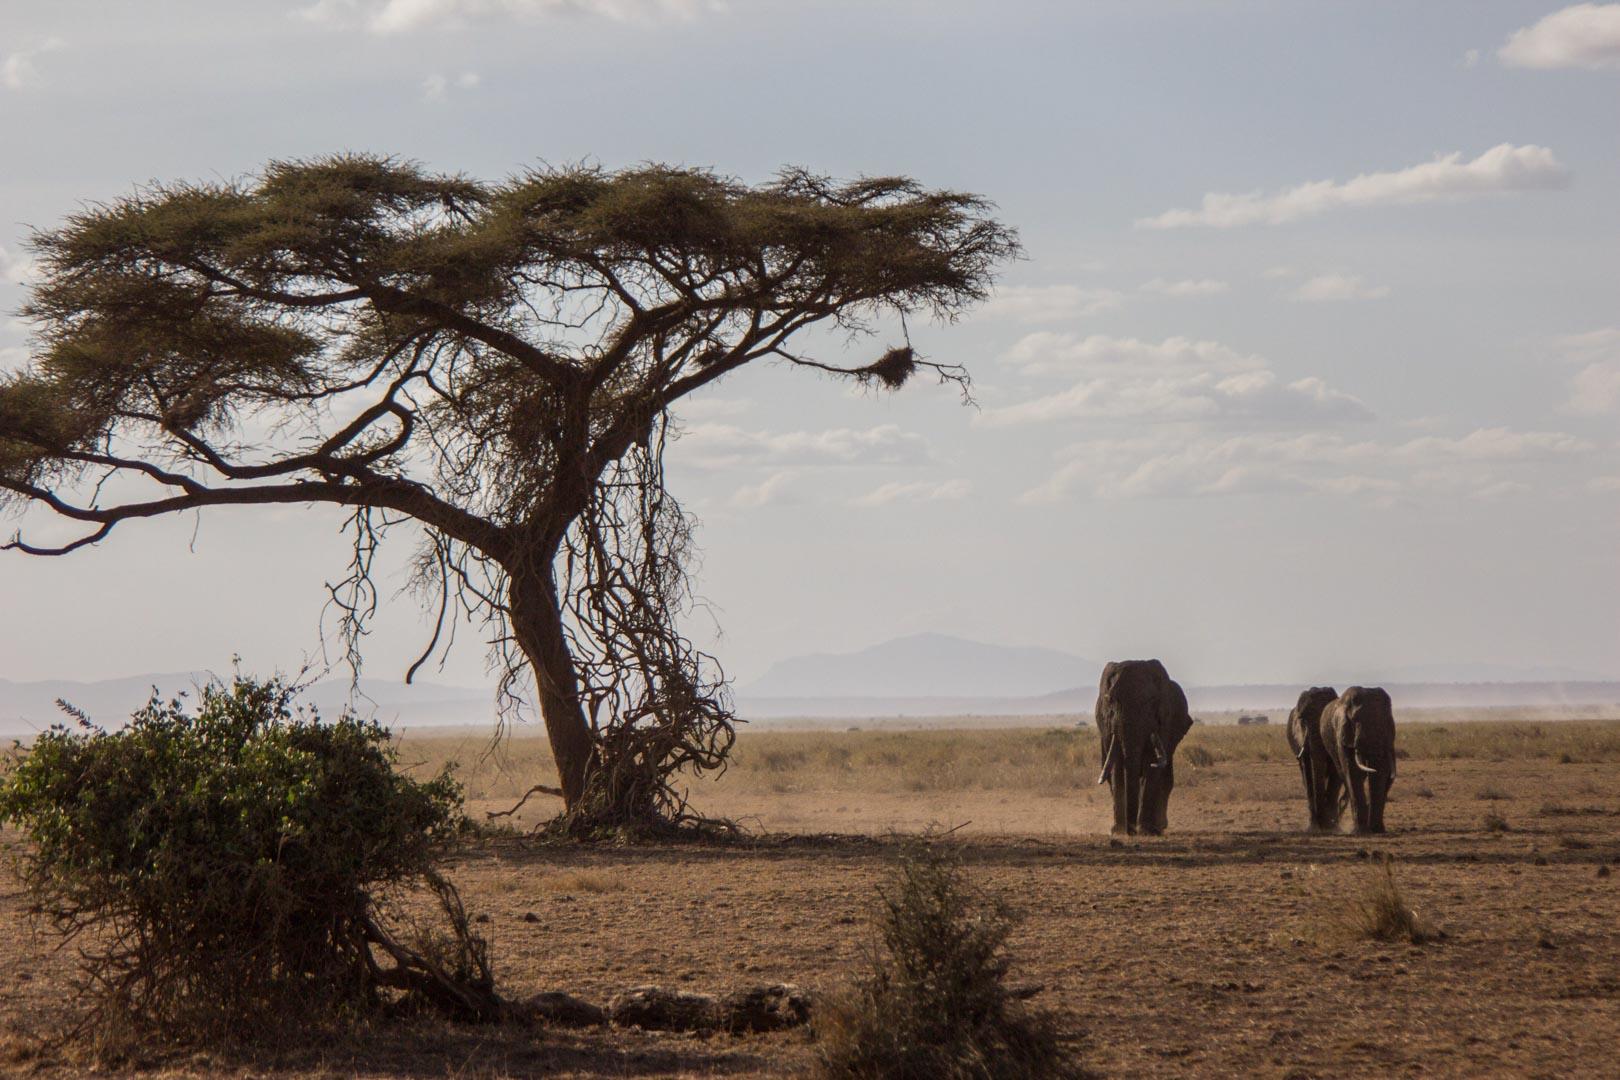 Manada de elefantes acercándose, Parque Nacional de Amboseli, Kenia